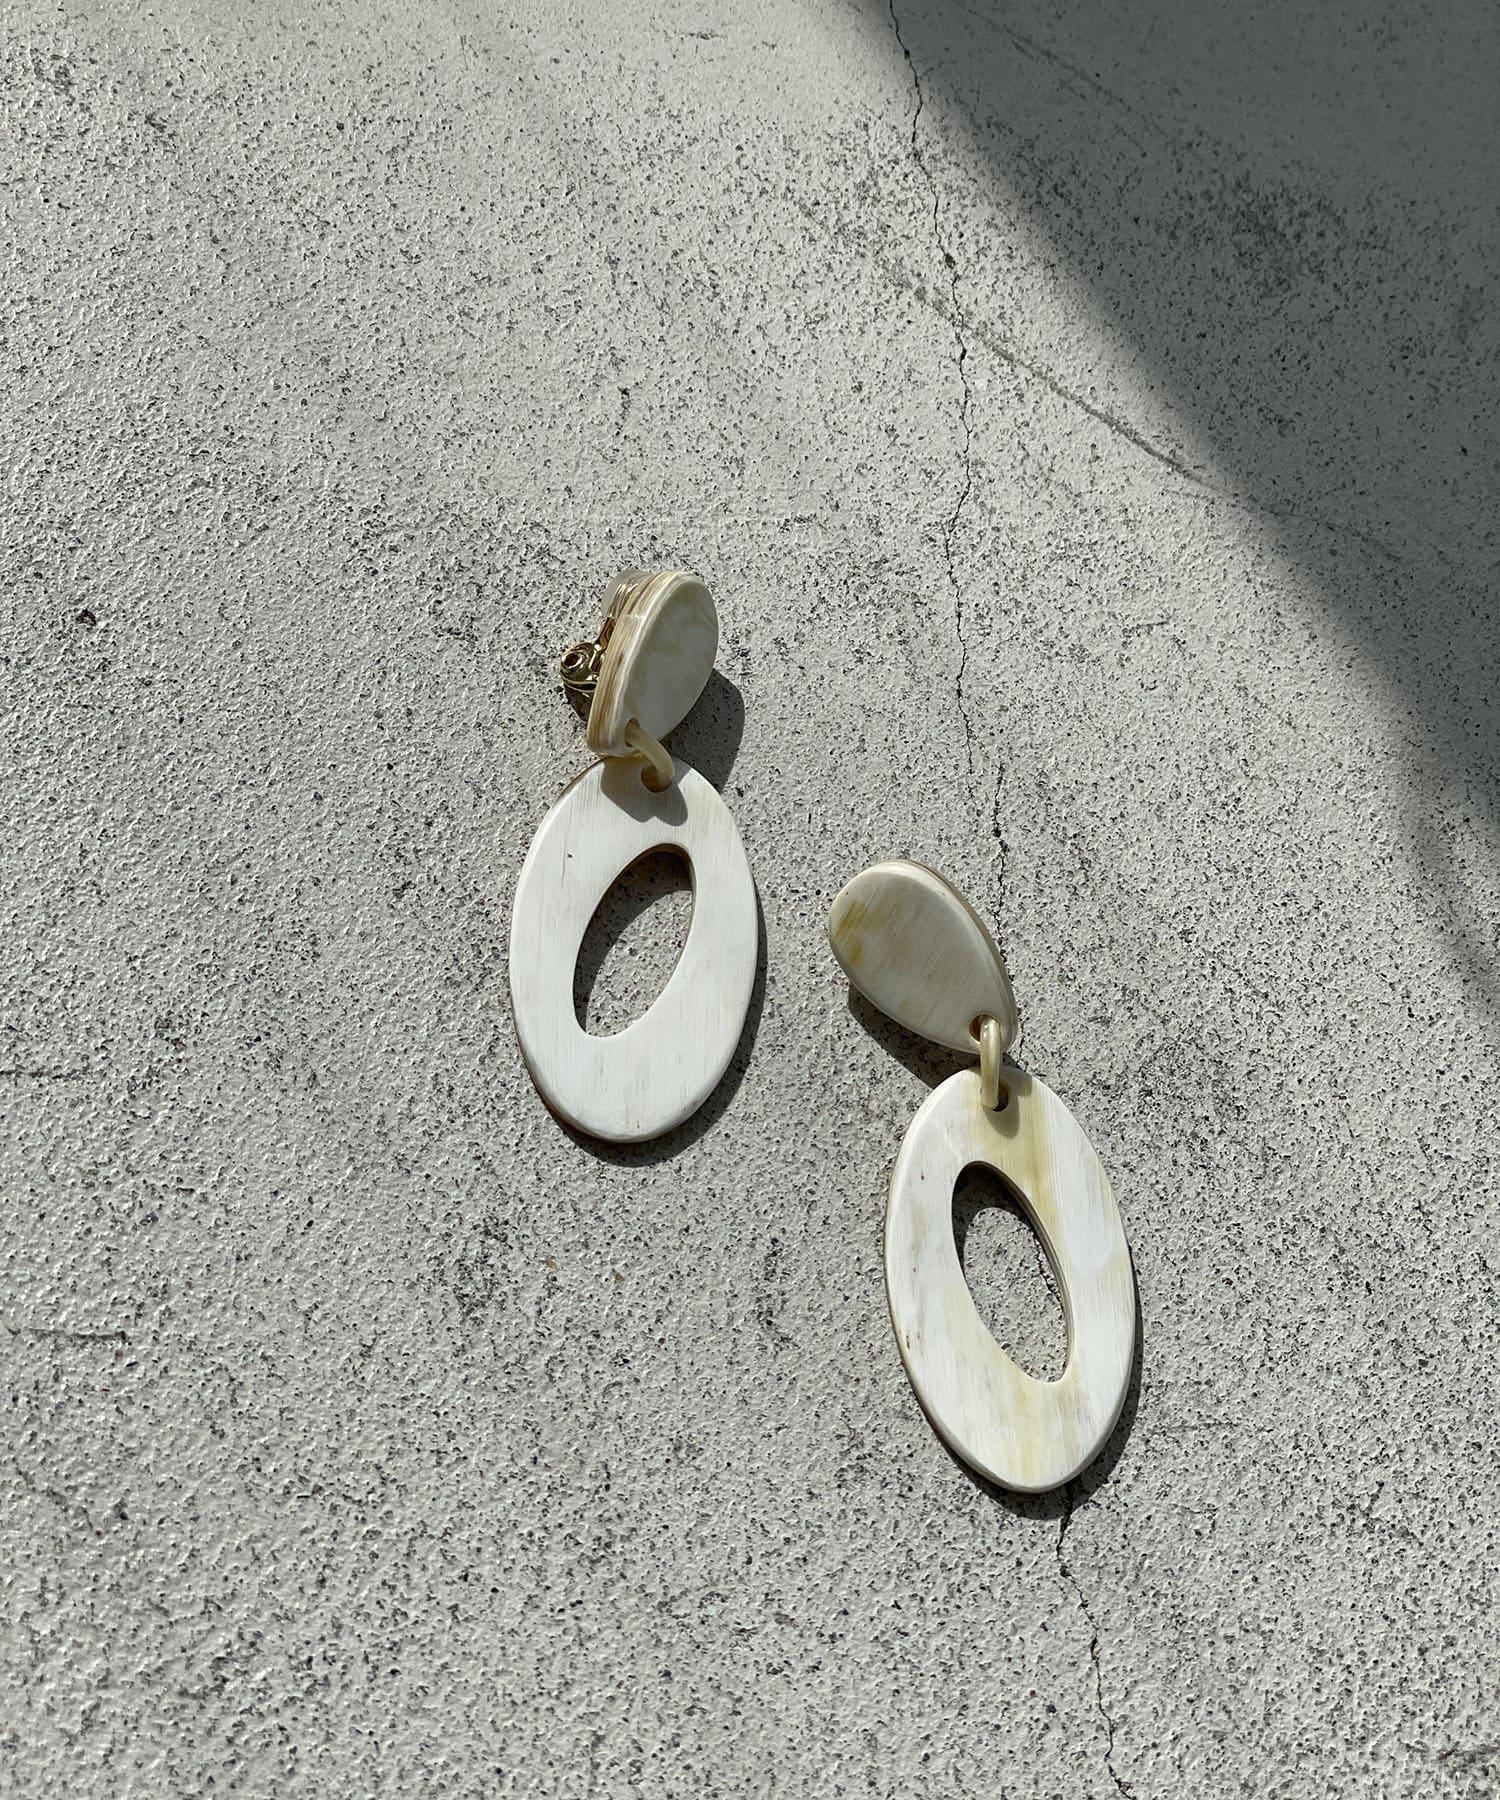 RIVE DROITE(リヴドロワ) 【ベーシックコーデにも映える】オーバルホールイヤリング